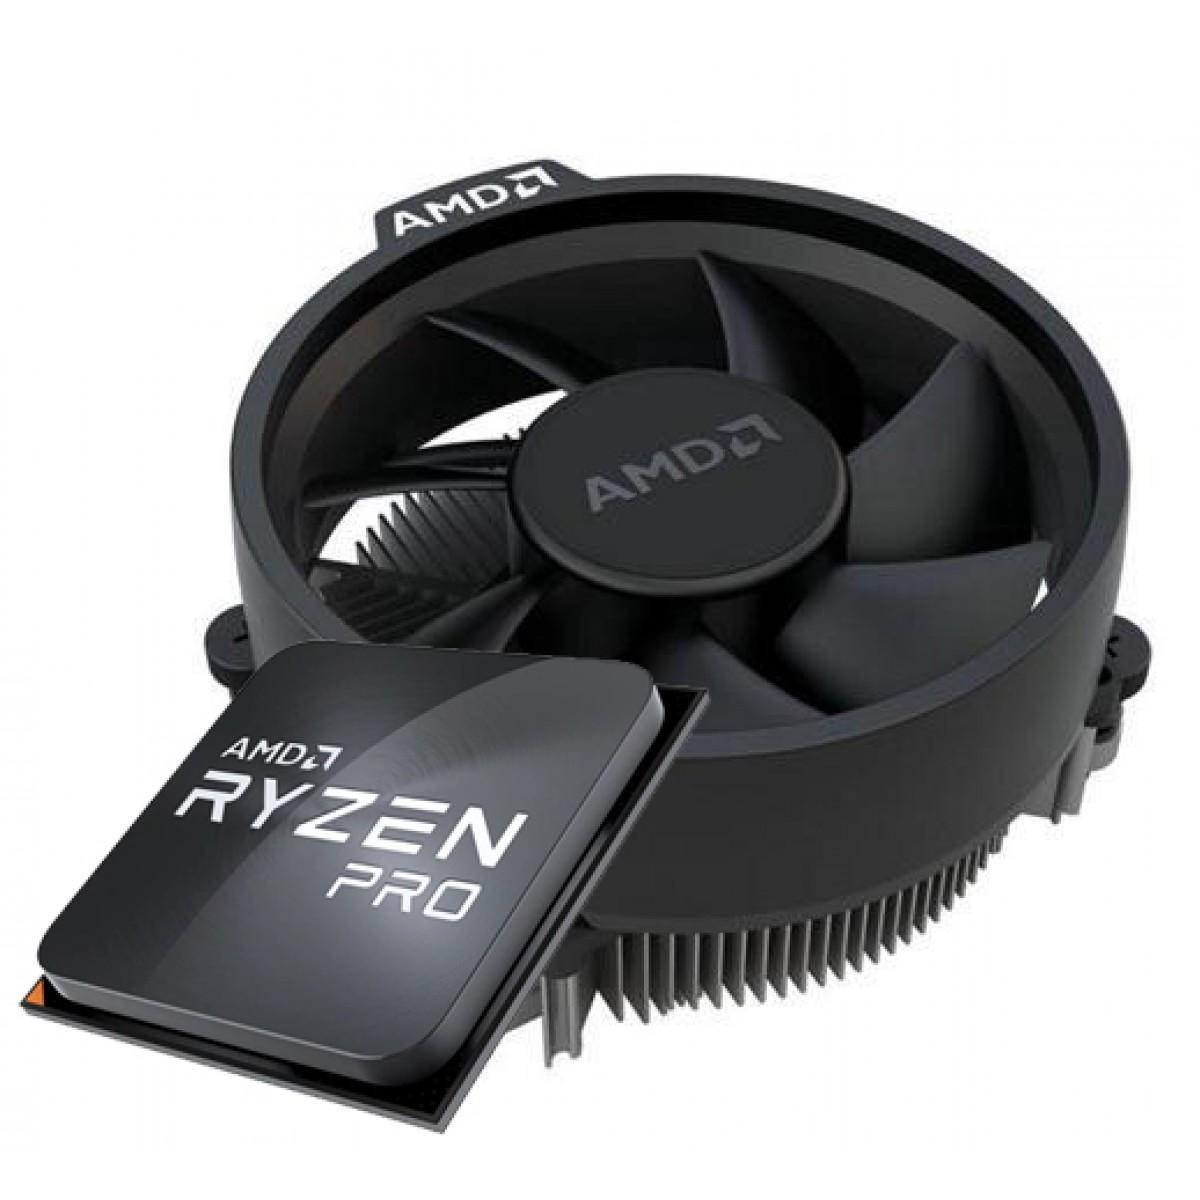 Processador AMD Ryzen 3 PRO 4350G 3.8GHz (4.0GHz Turbo), 4-Cores 8-Threads, C/ Video Integrado, AM4, + Cooler Wraith Stealth, 100-100000148MPK